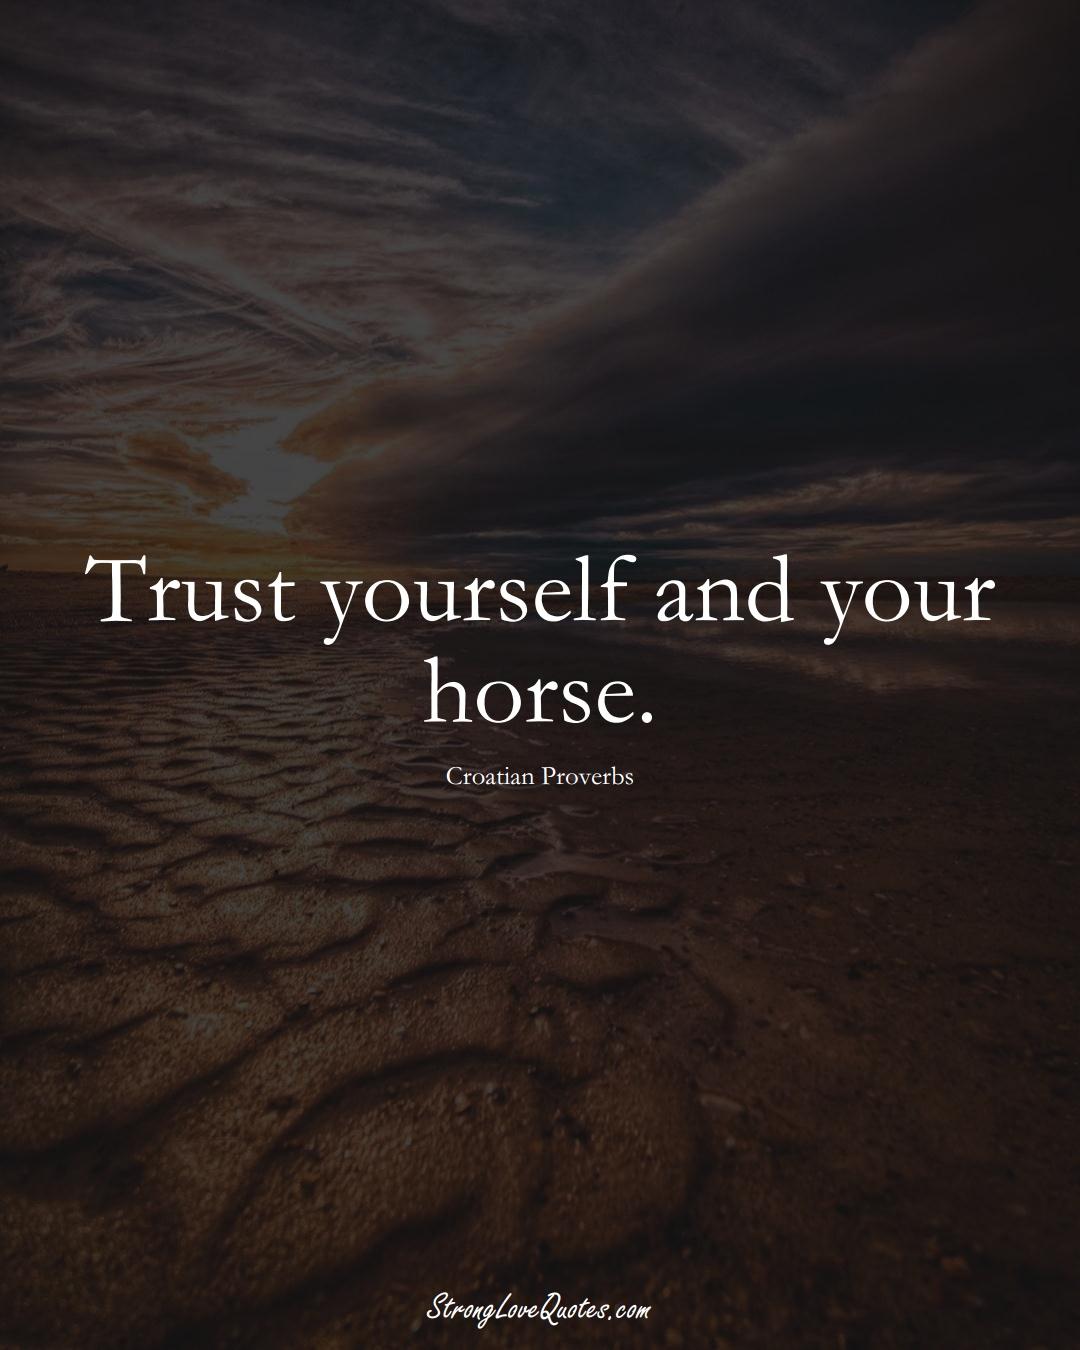 Trust yourself and your horse. (Croatian Sayings);  #EuropeanSayings